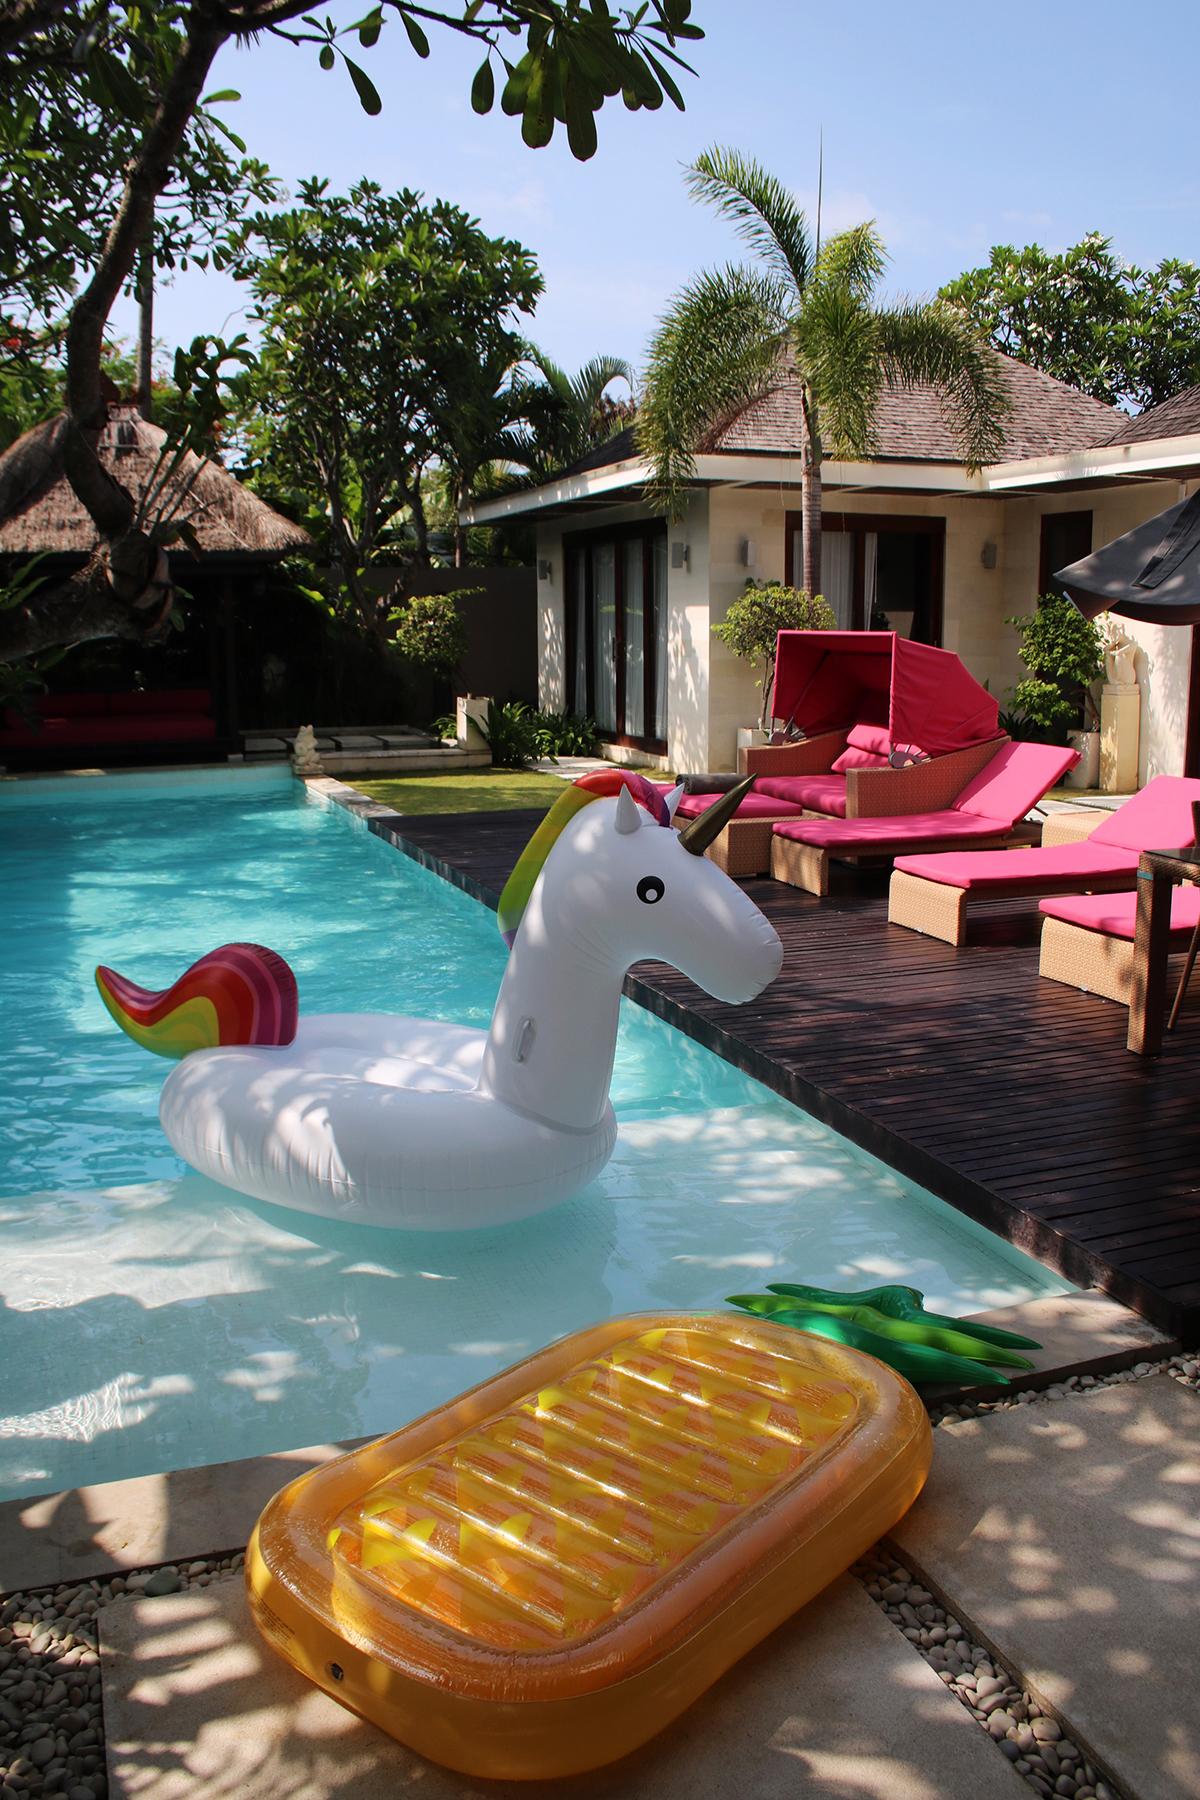 denpasar mature personals Most popular free bali dating site meet beautiful bali girls, kuta girls, denpasar women & indonesian singles for friendship, romance & fun.